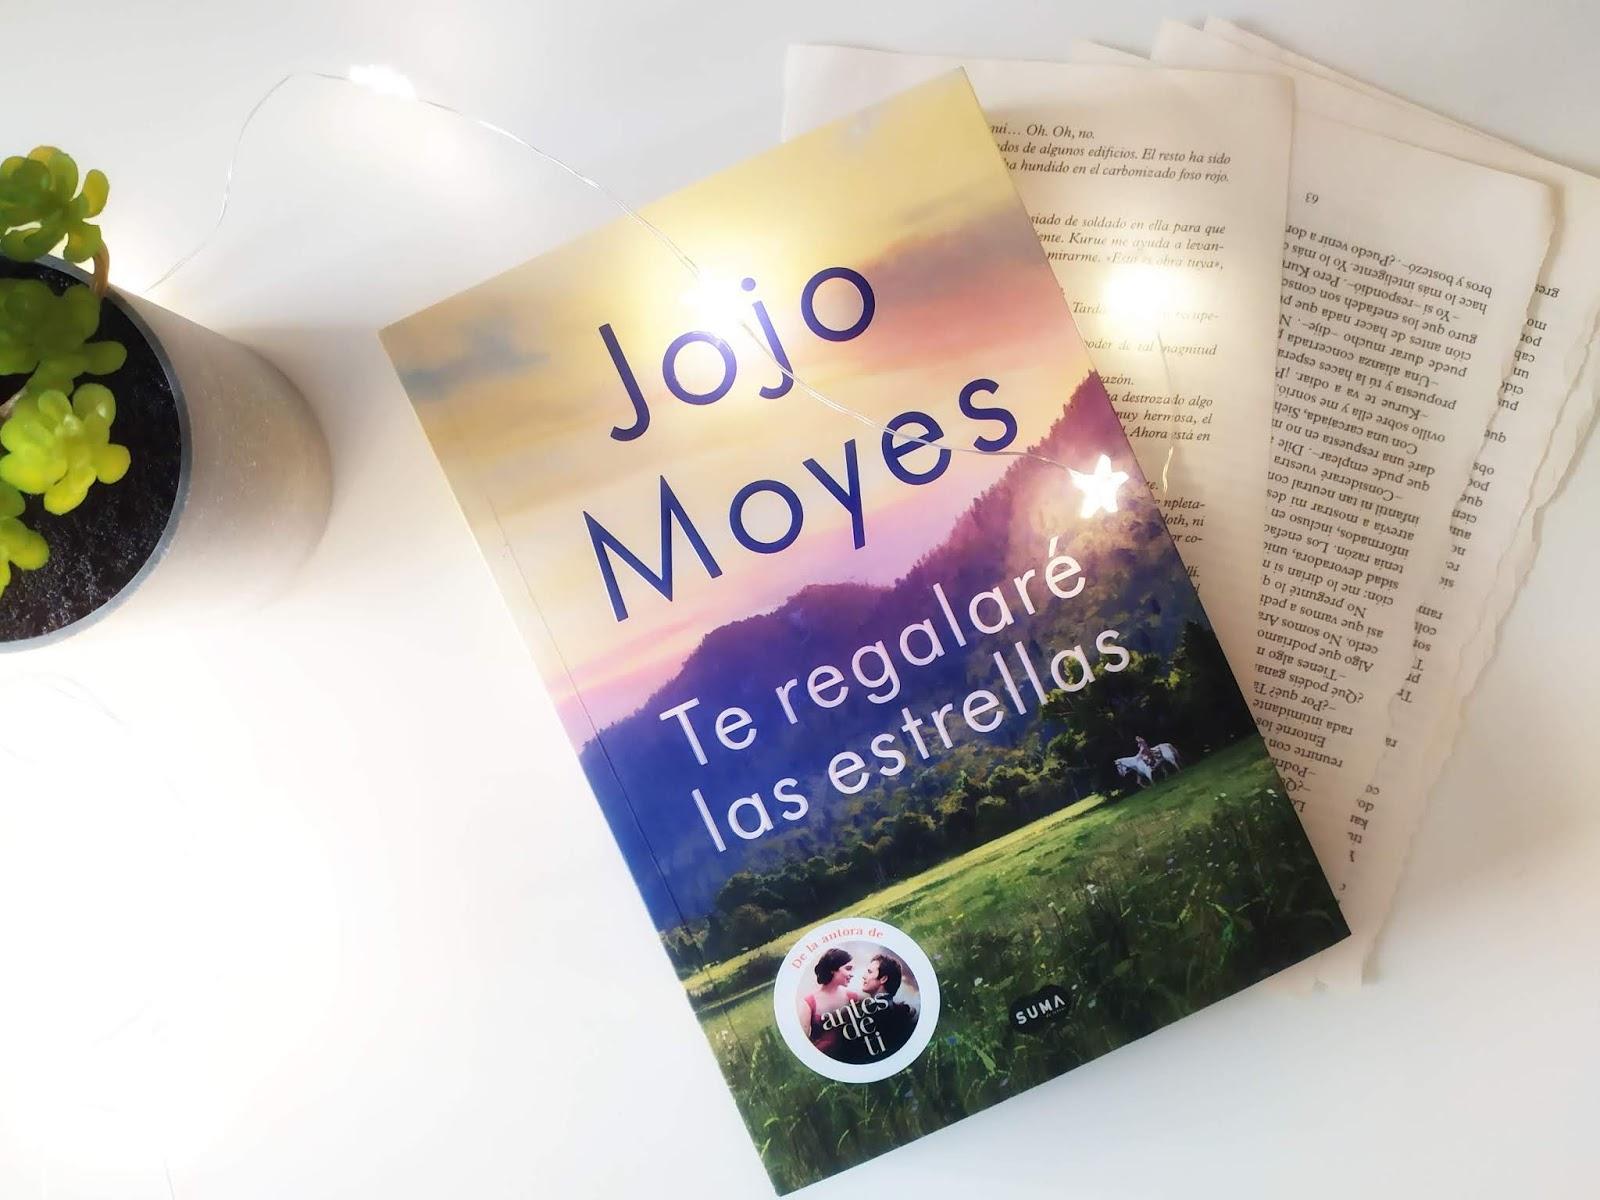 Te regalaré las estrellas, Jojo Moyes